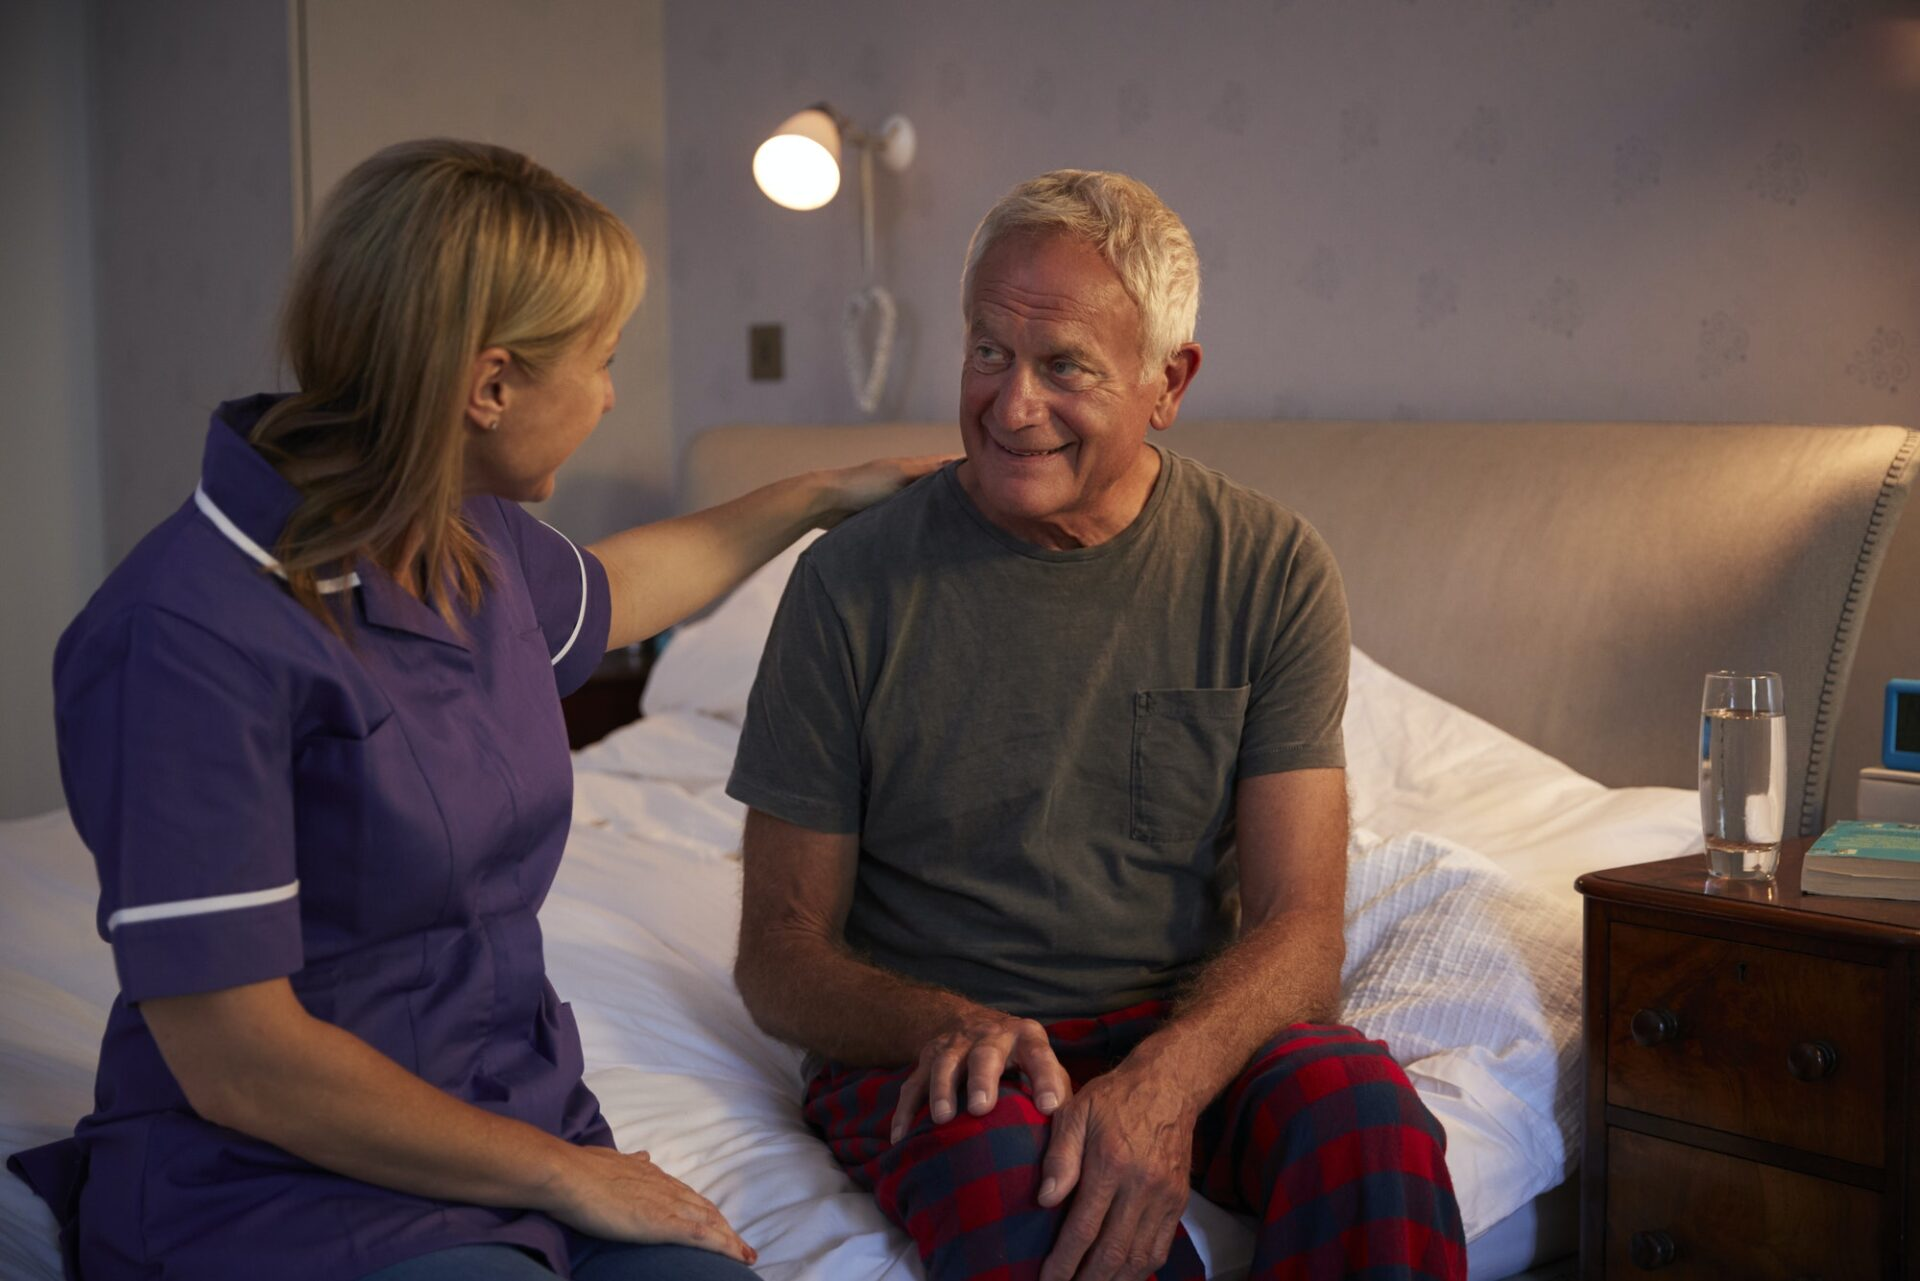 Nurse Talking With Senior Man In Bedroom On Home Visit